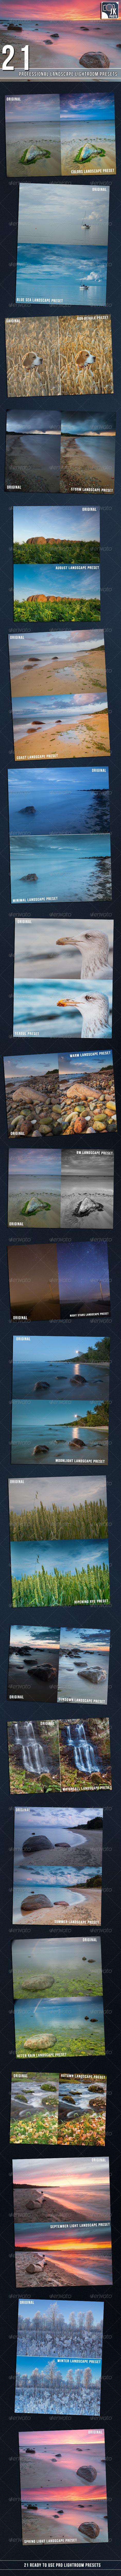 GraphicRiver 21 PRO Lightroom Presets Landscape and Nature 6841552